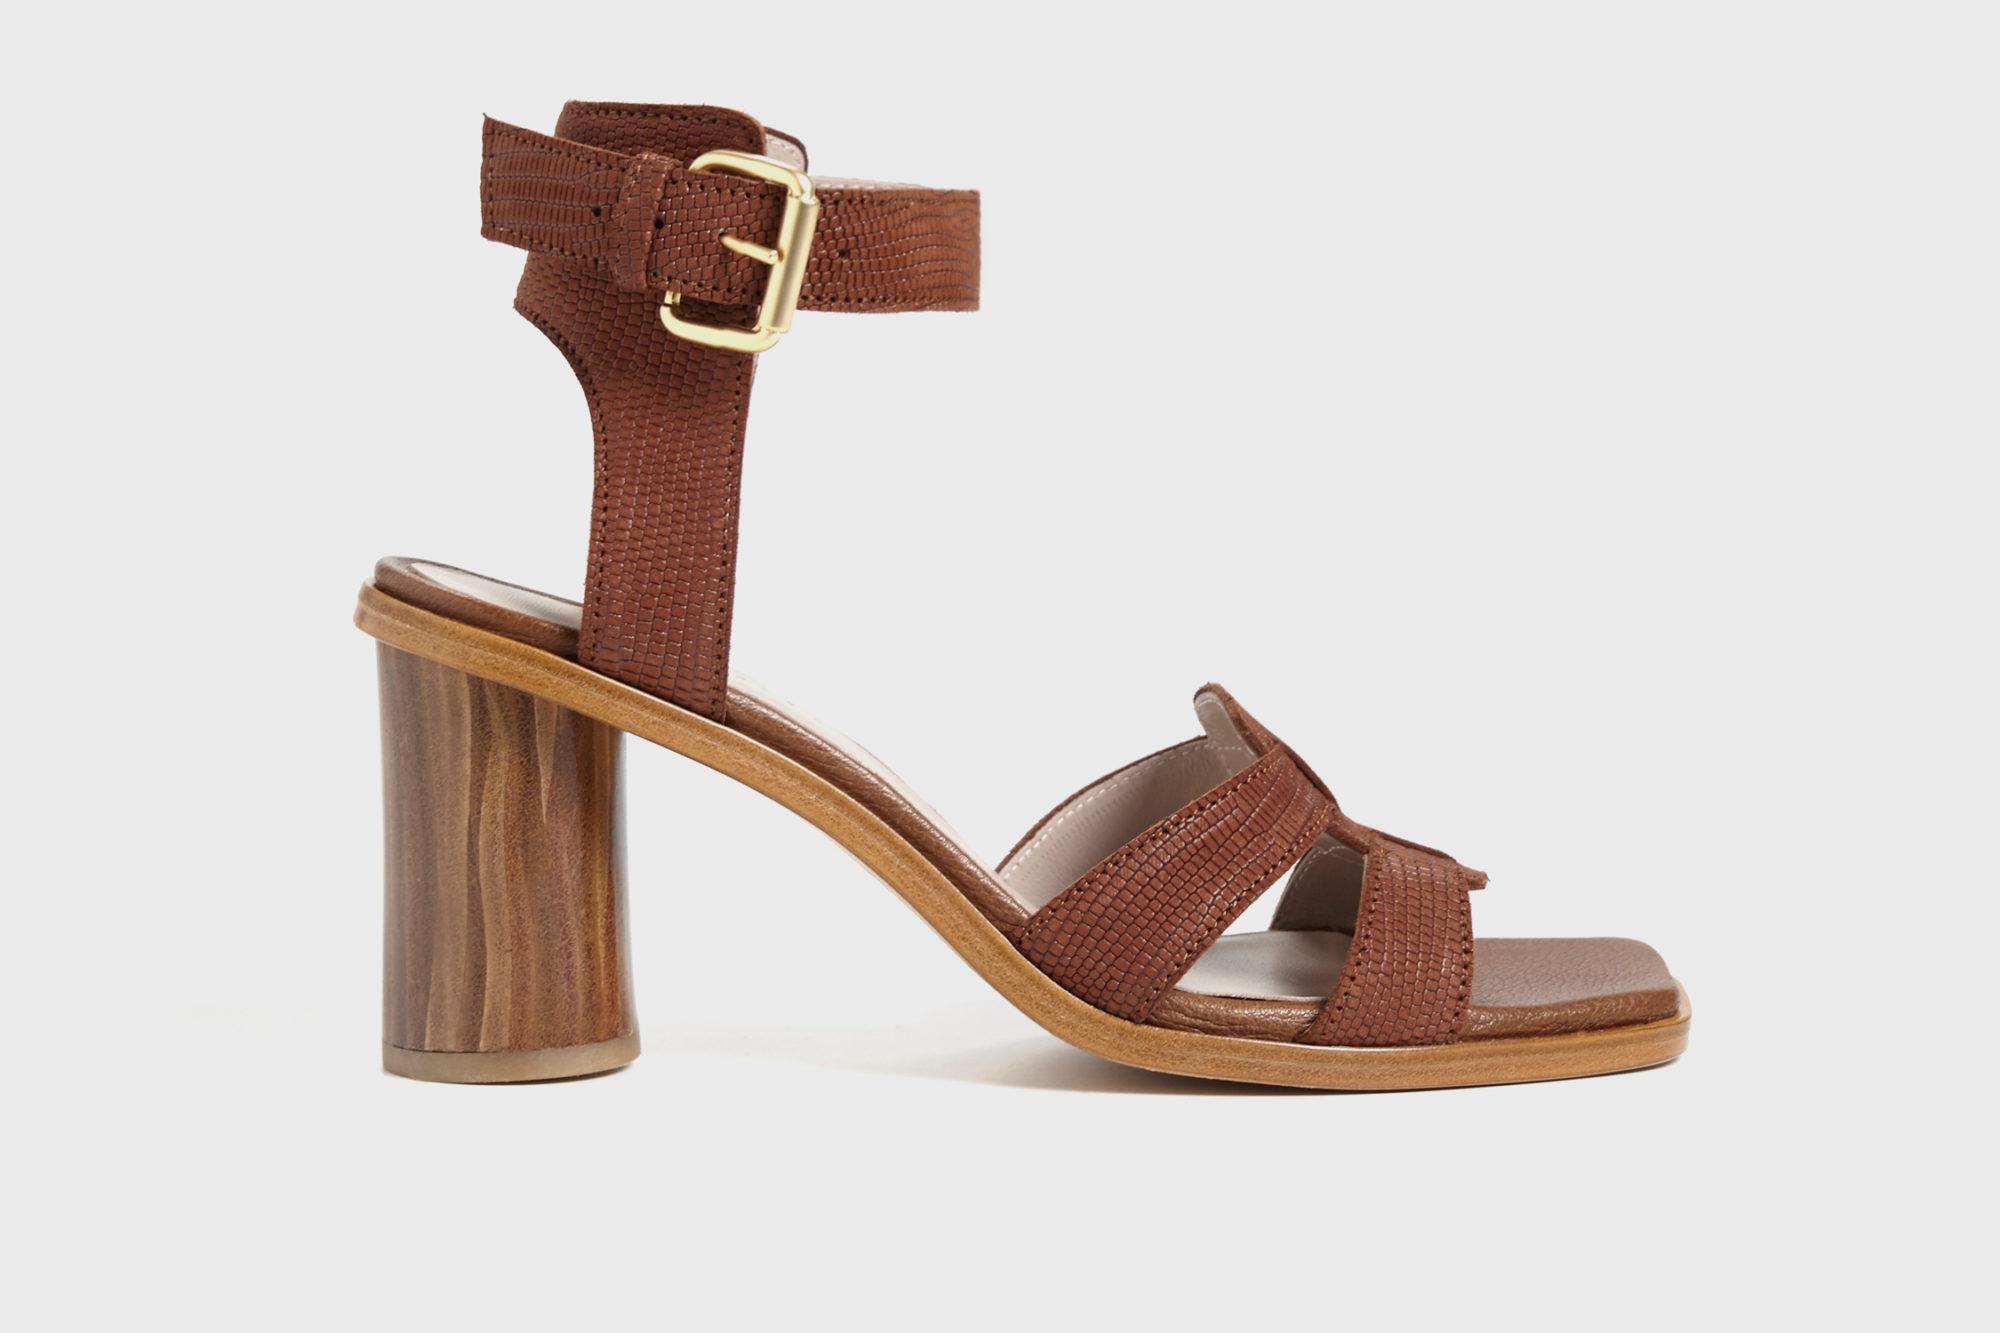 Dorotea sandalia de tacón alto Lianne marrón ss17 perfil